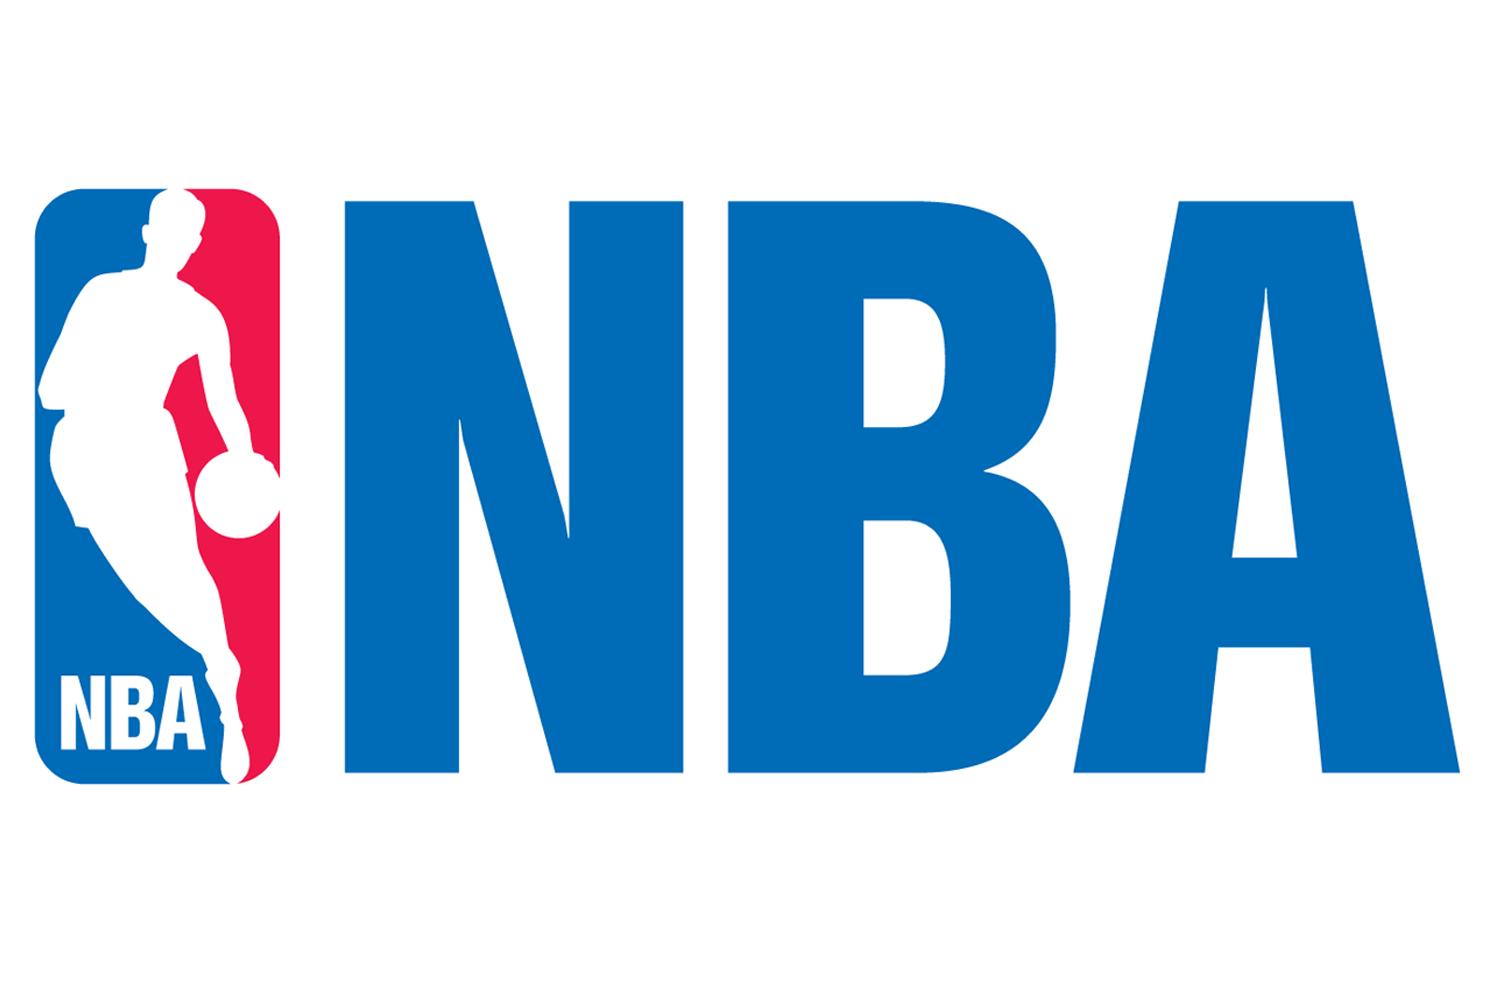 NBA_logo.png